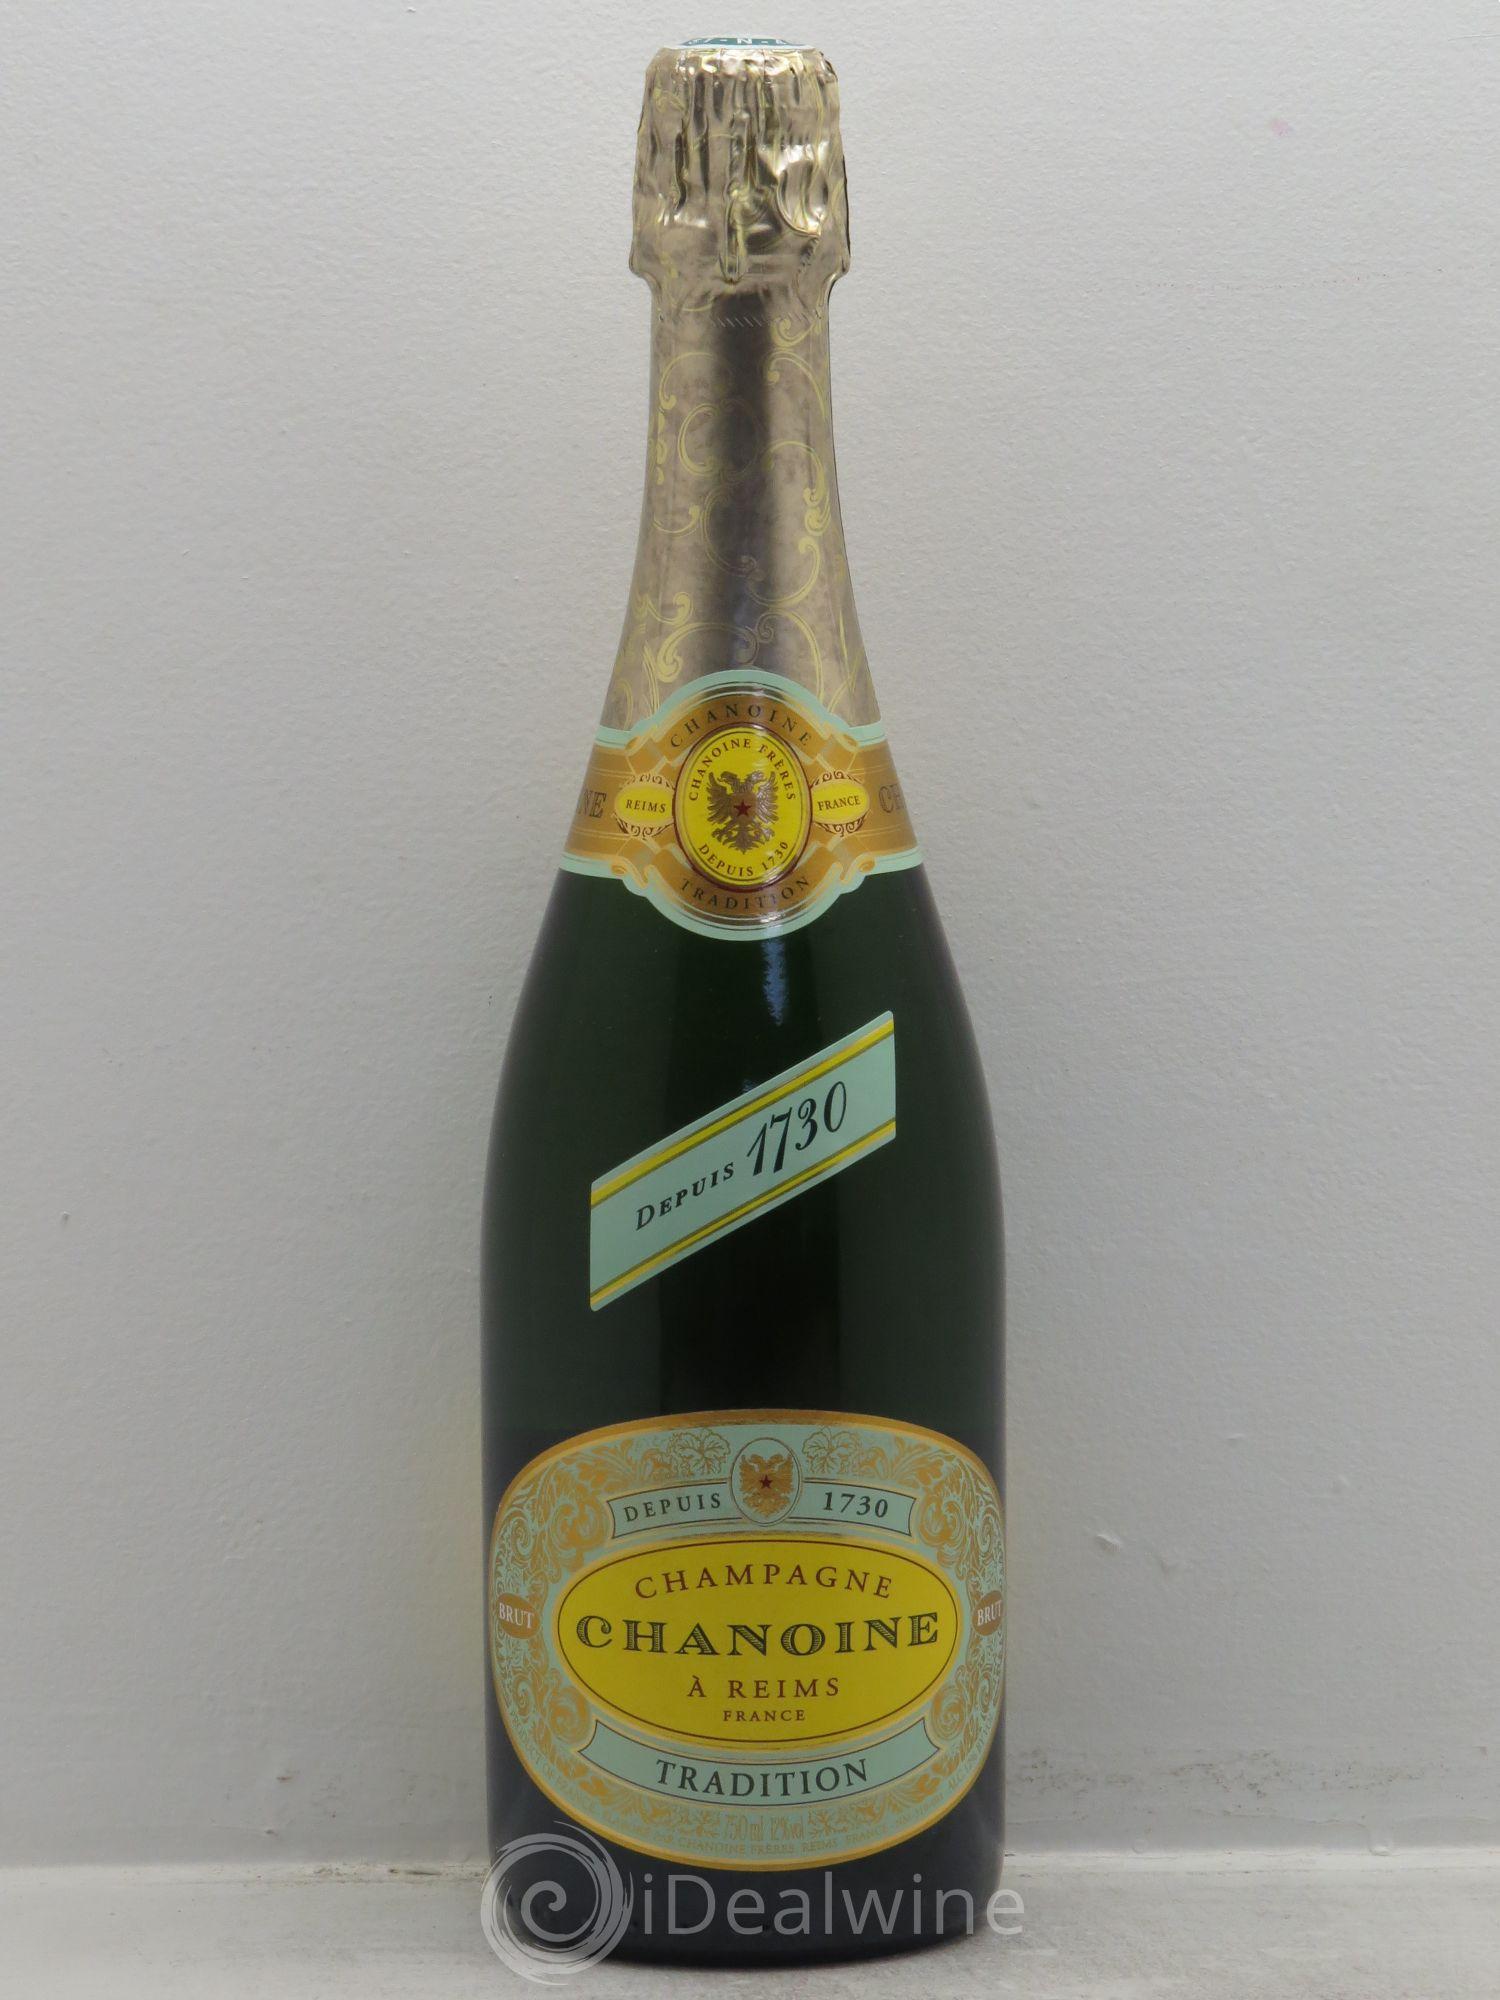 acheter brut champagne chanoine tradition sans prix de r serve lot 1080. Black Bedroom Furniture Sets. Home Design Ideas